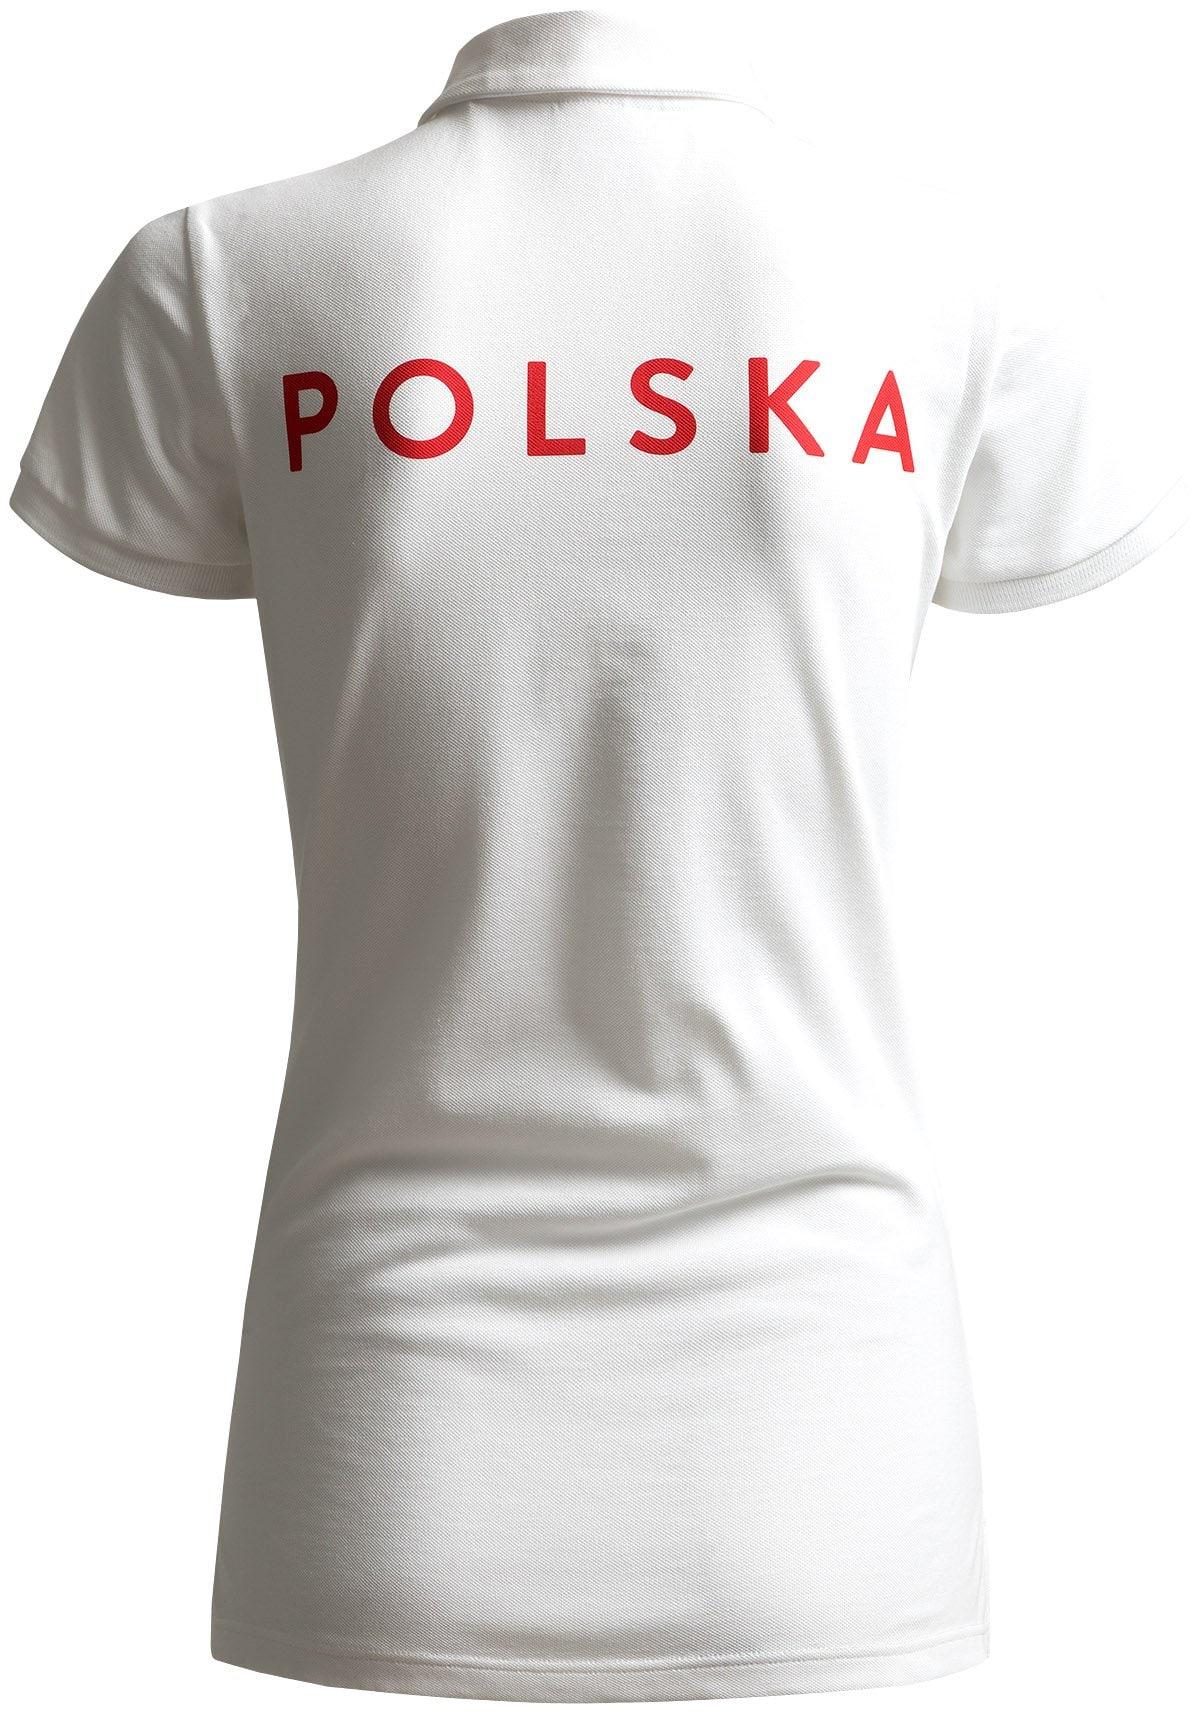 aeb75b551 Koszulka polo damska Polska Pyeongchang 2018 TSD211 - BIAŁY